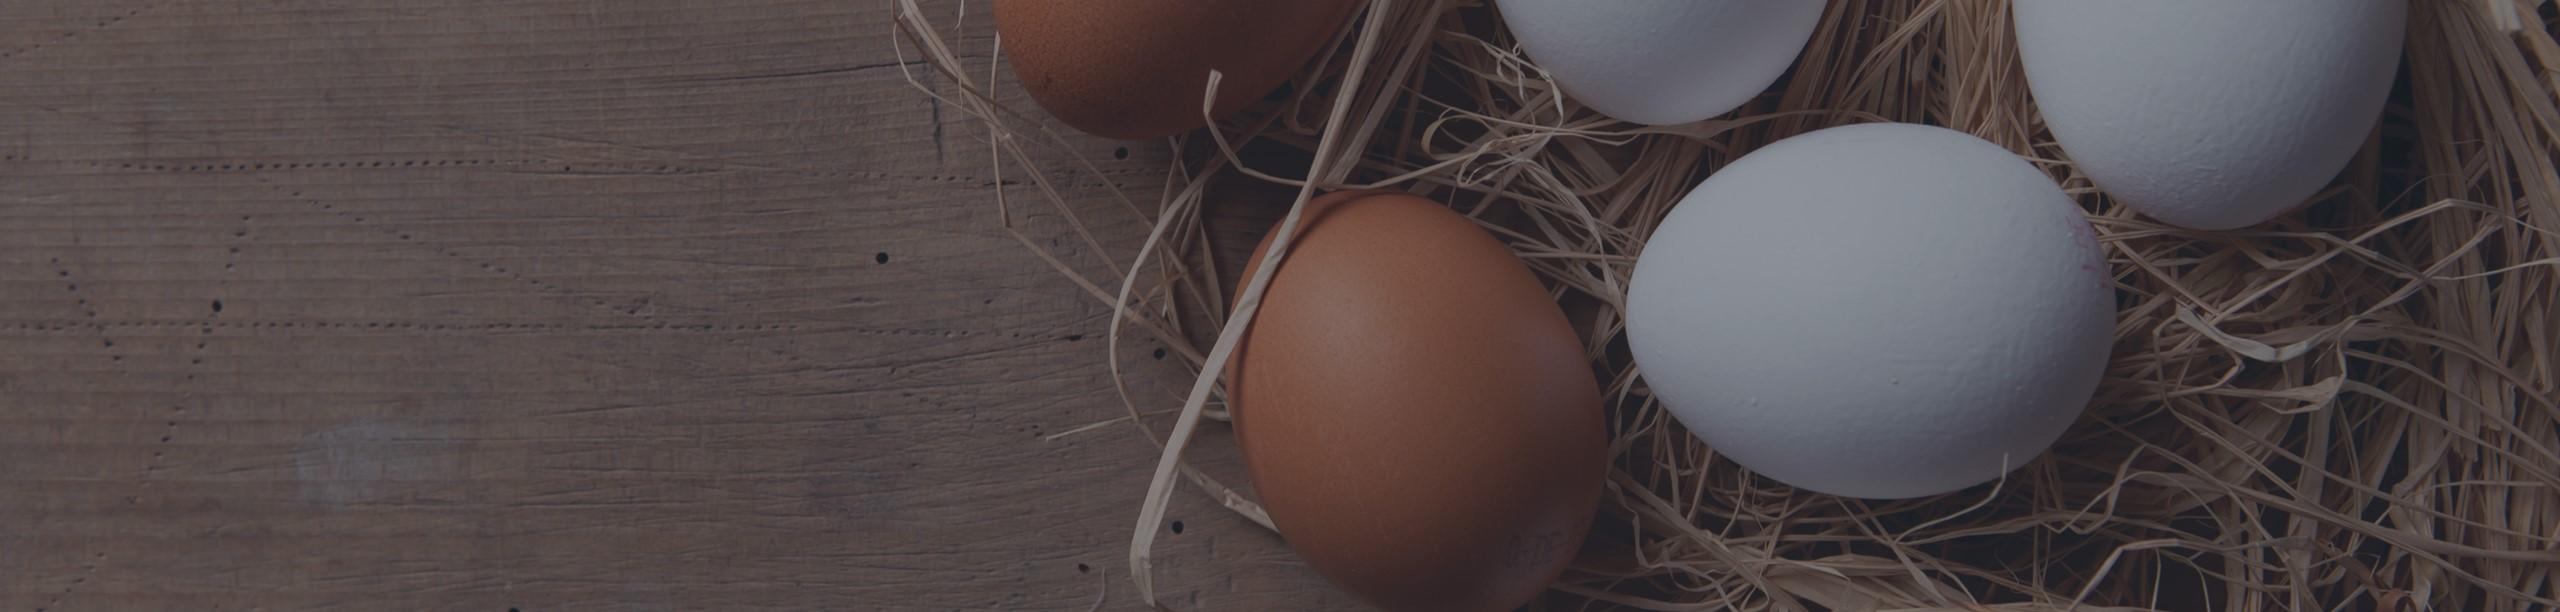 Eggs1-1